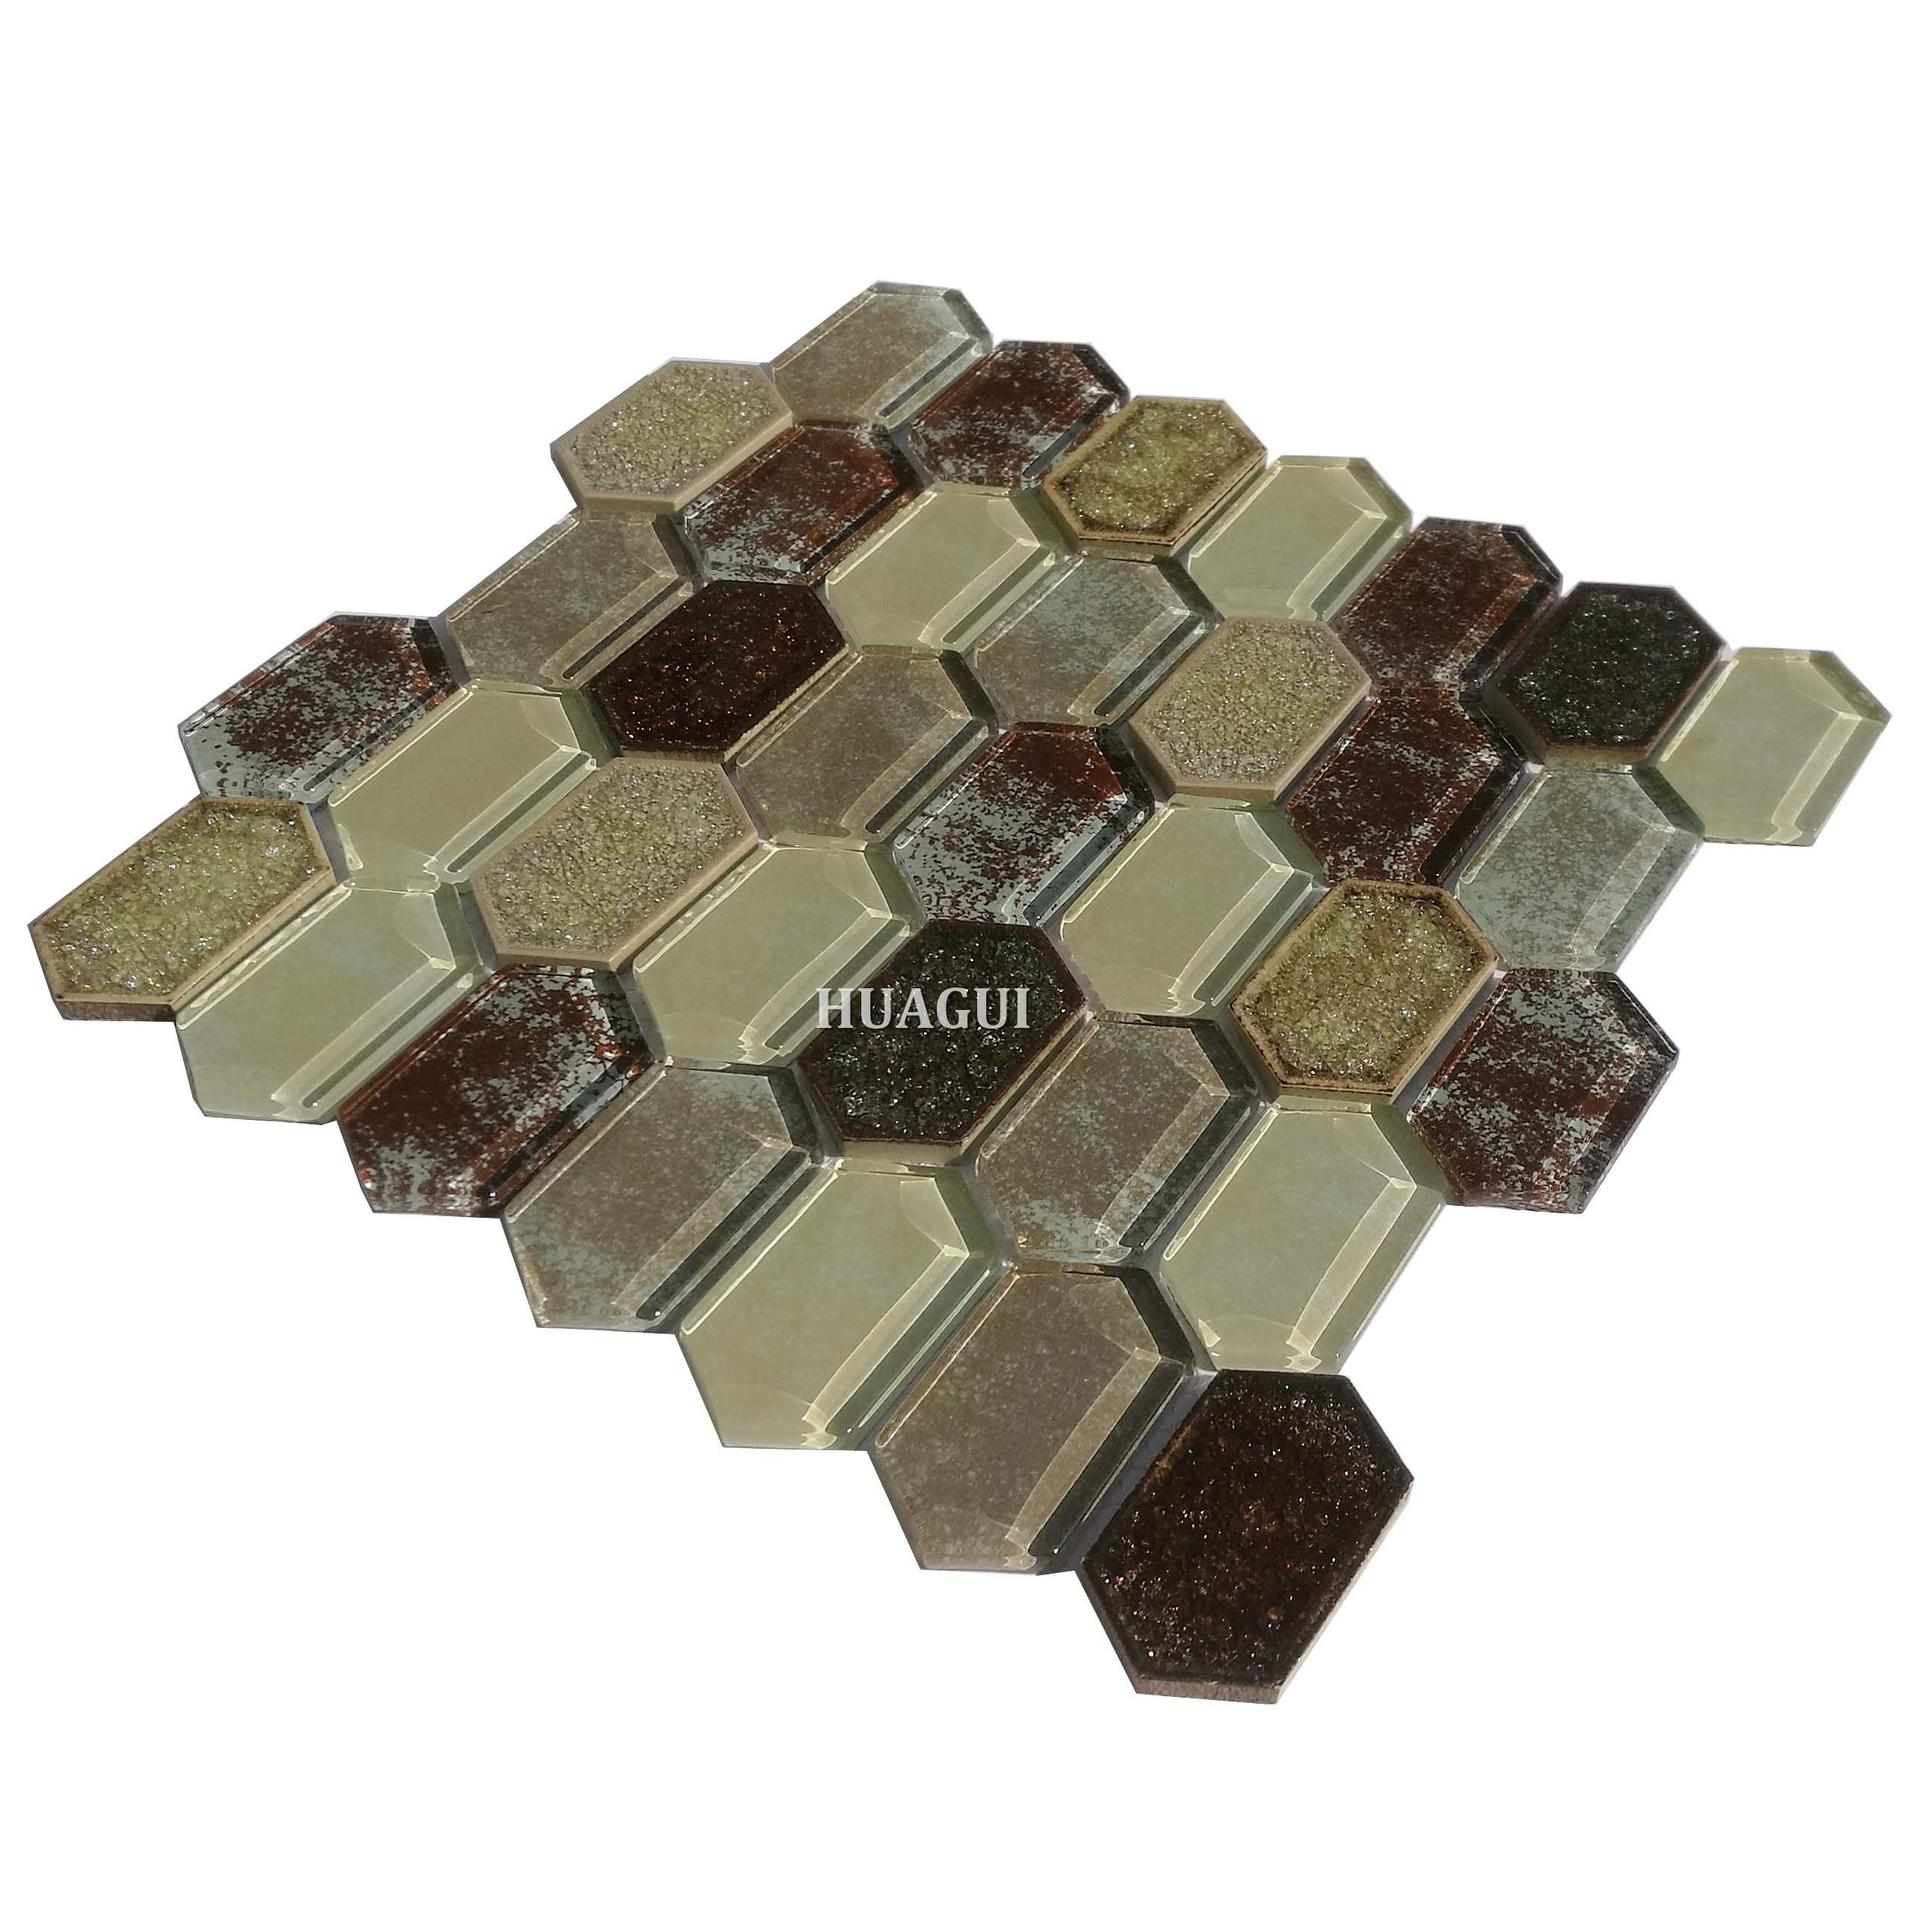 Broken glass ceramic backsplash mosaic tile art  wall patterns in London